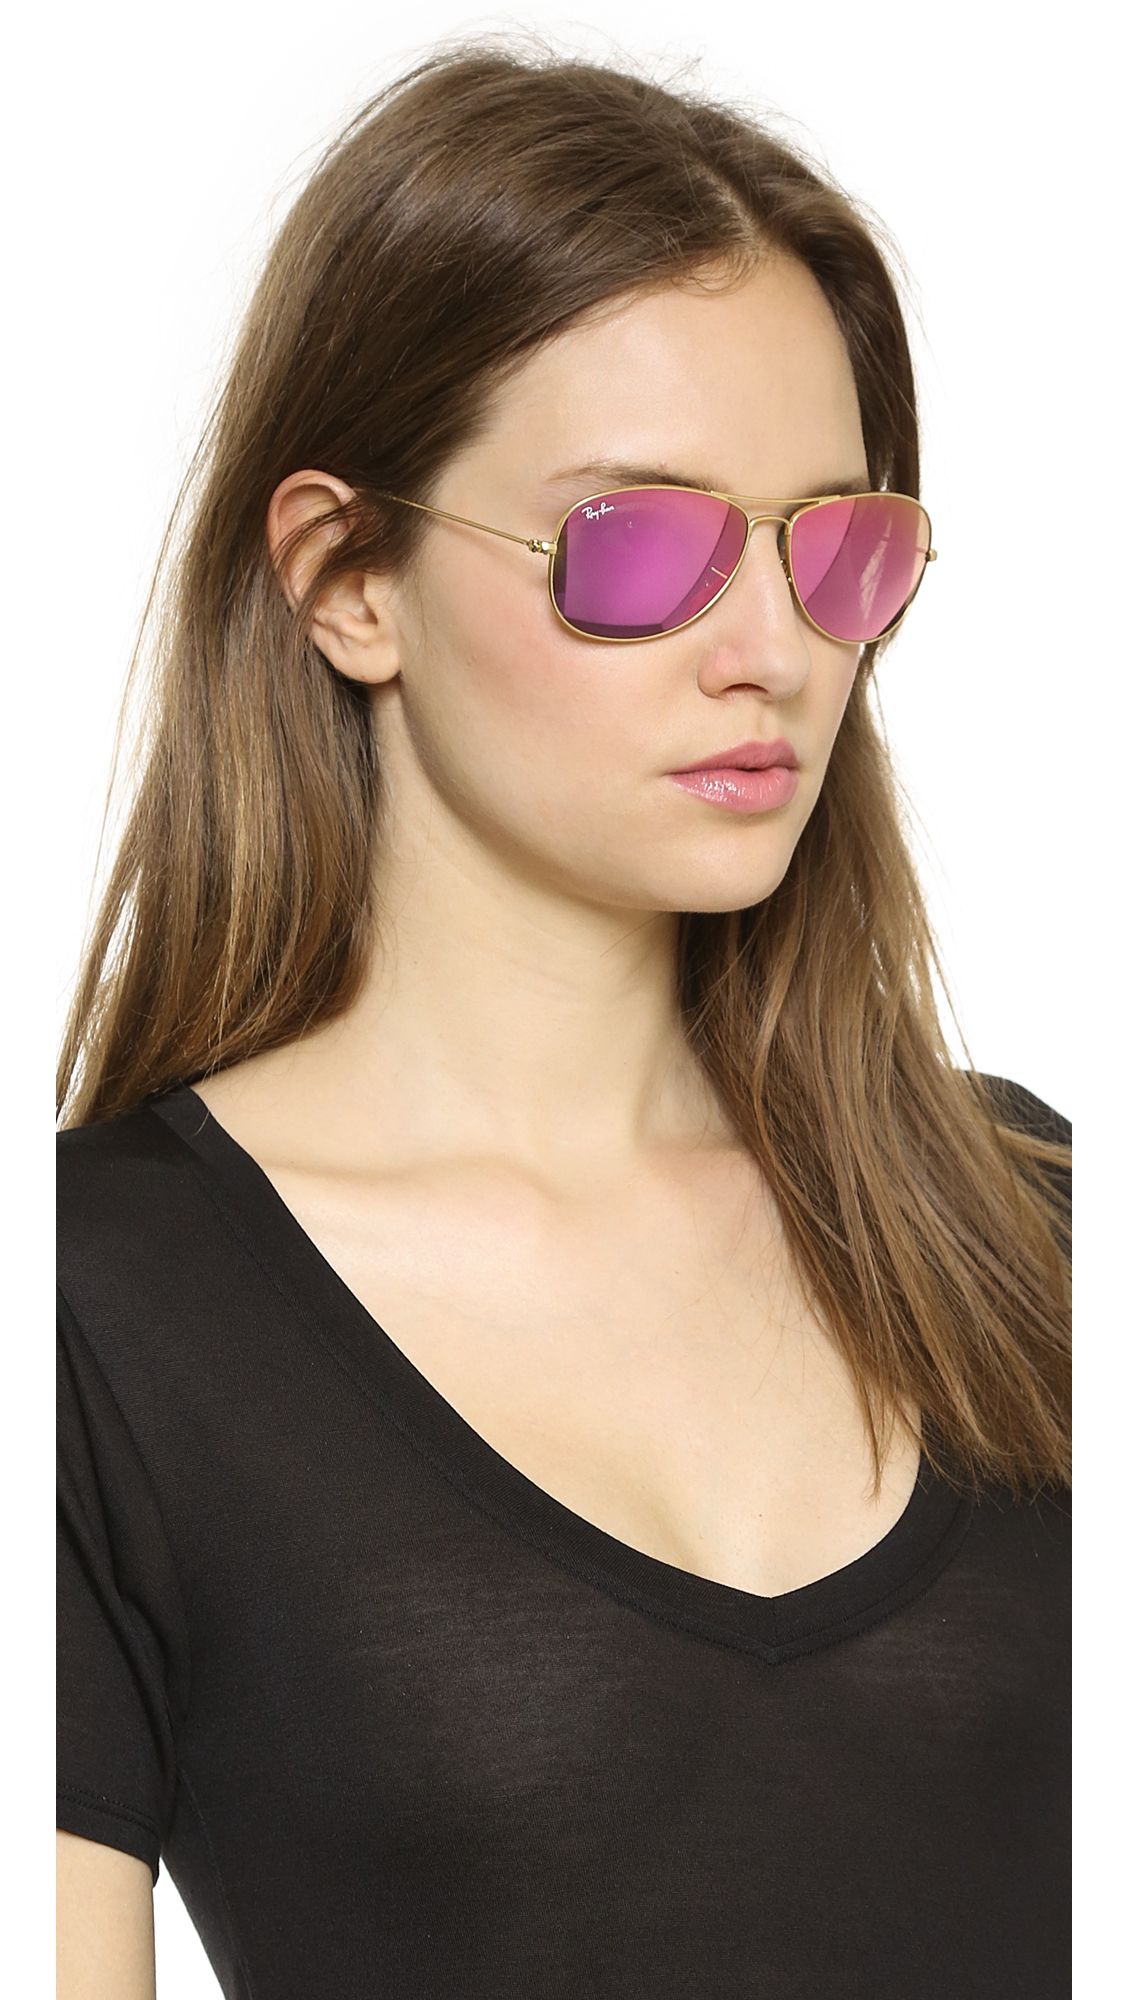 ... ray ban womens aviator sunglasses lilac ...